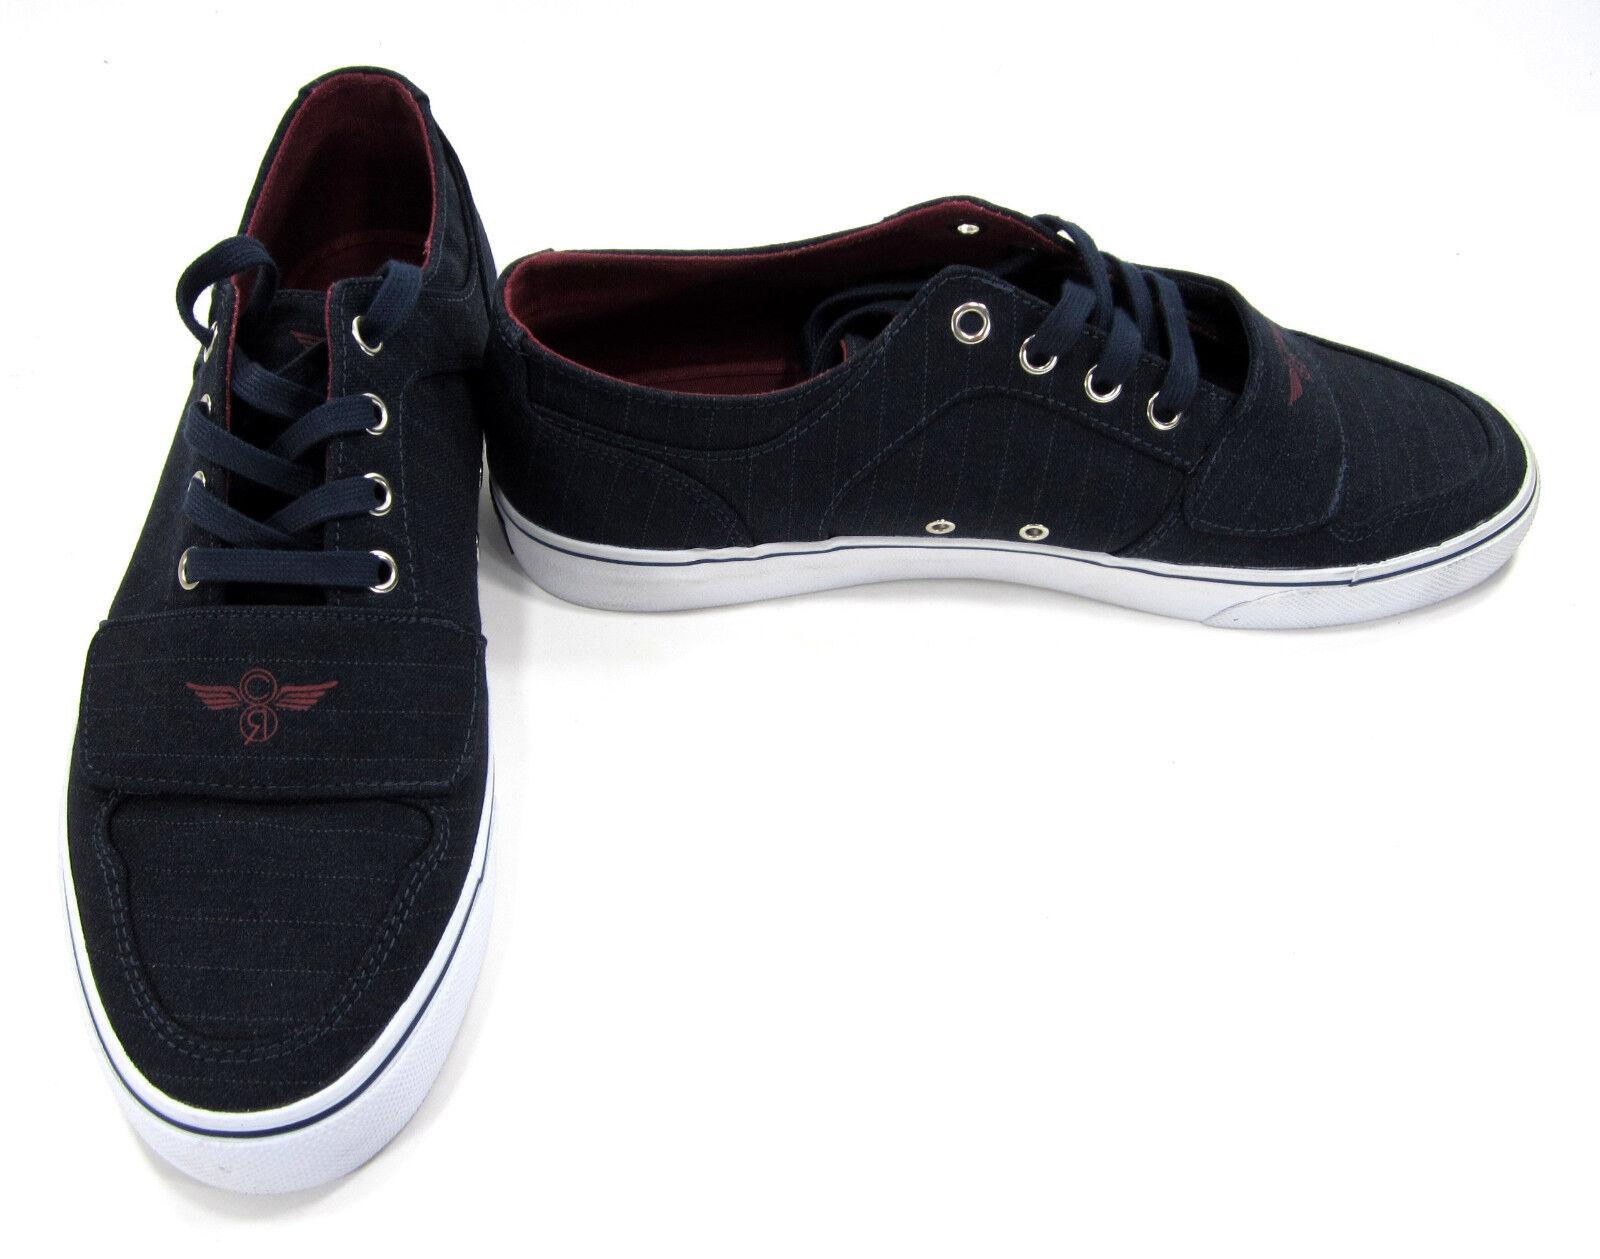 Creative Recreation shoes Cesario Lo XVI Pinstripe Navy bluee Sneakers Size 10.5